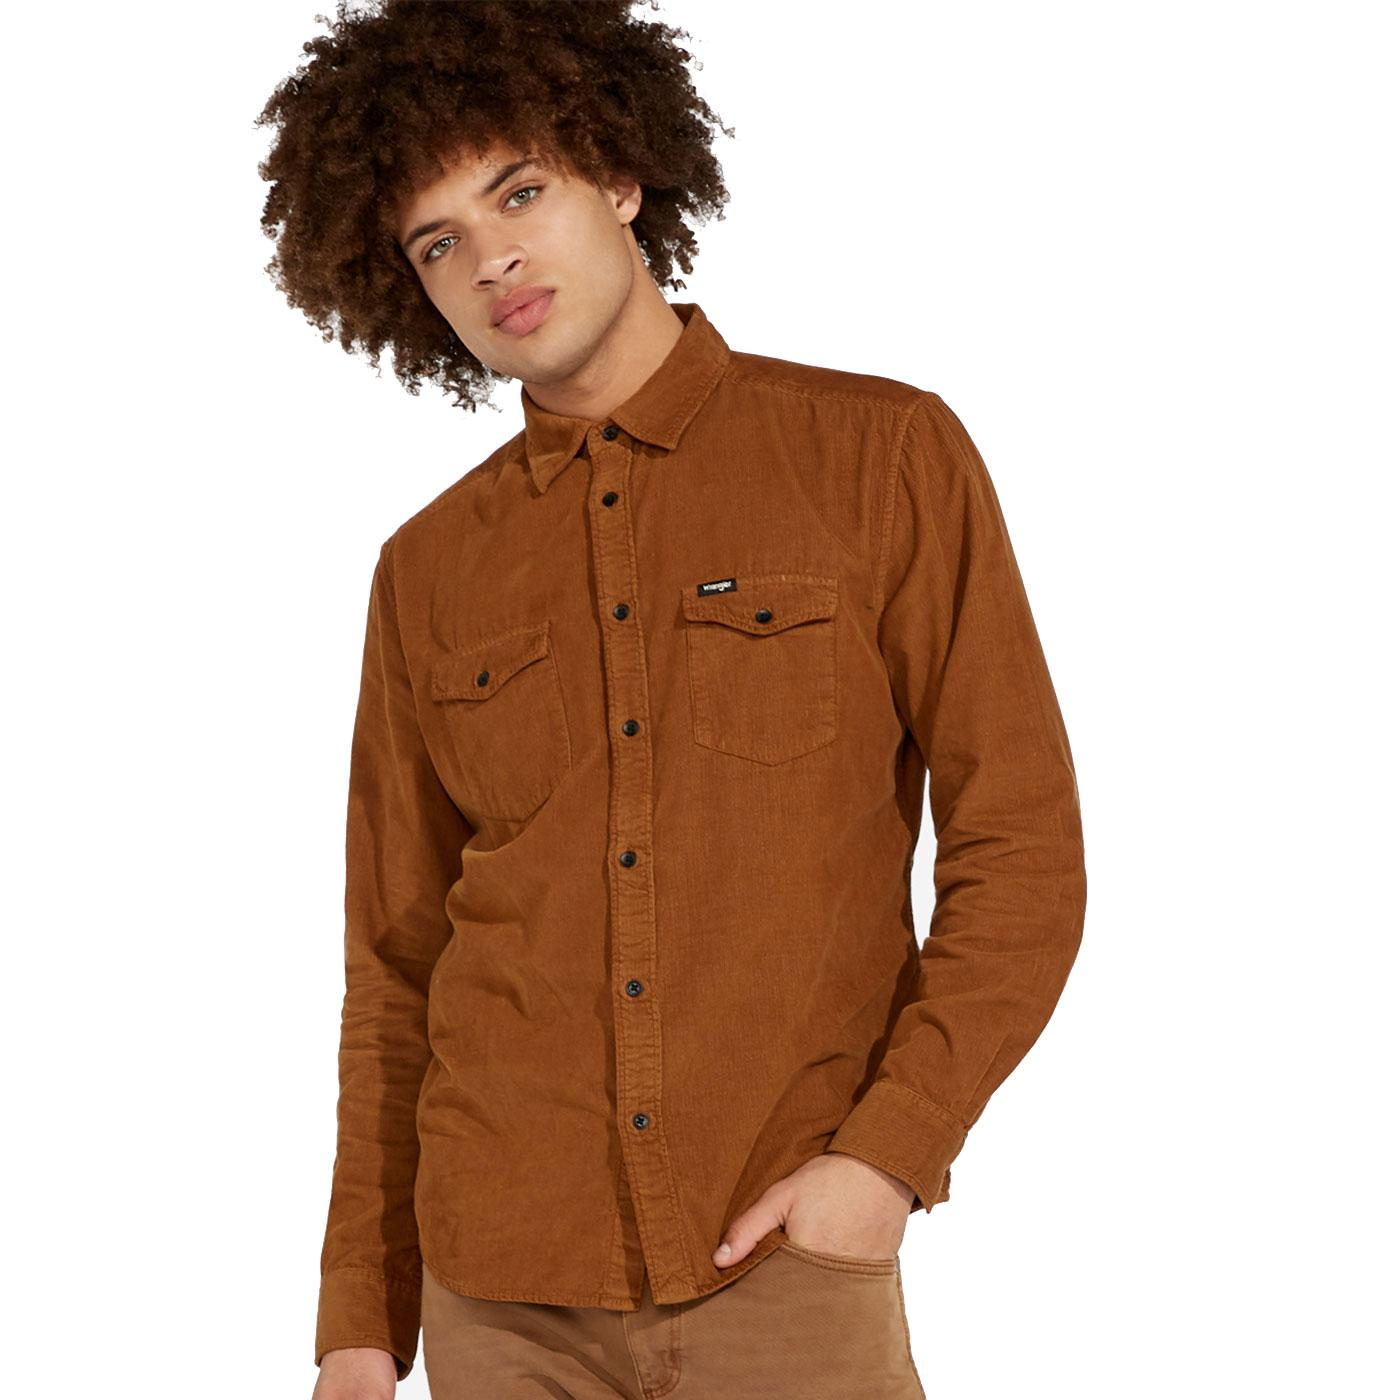 WRANGLER 70's Retro 2 Pocket Western Cord Shirt